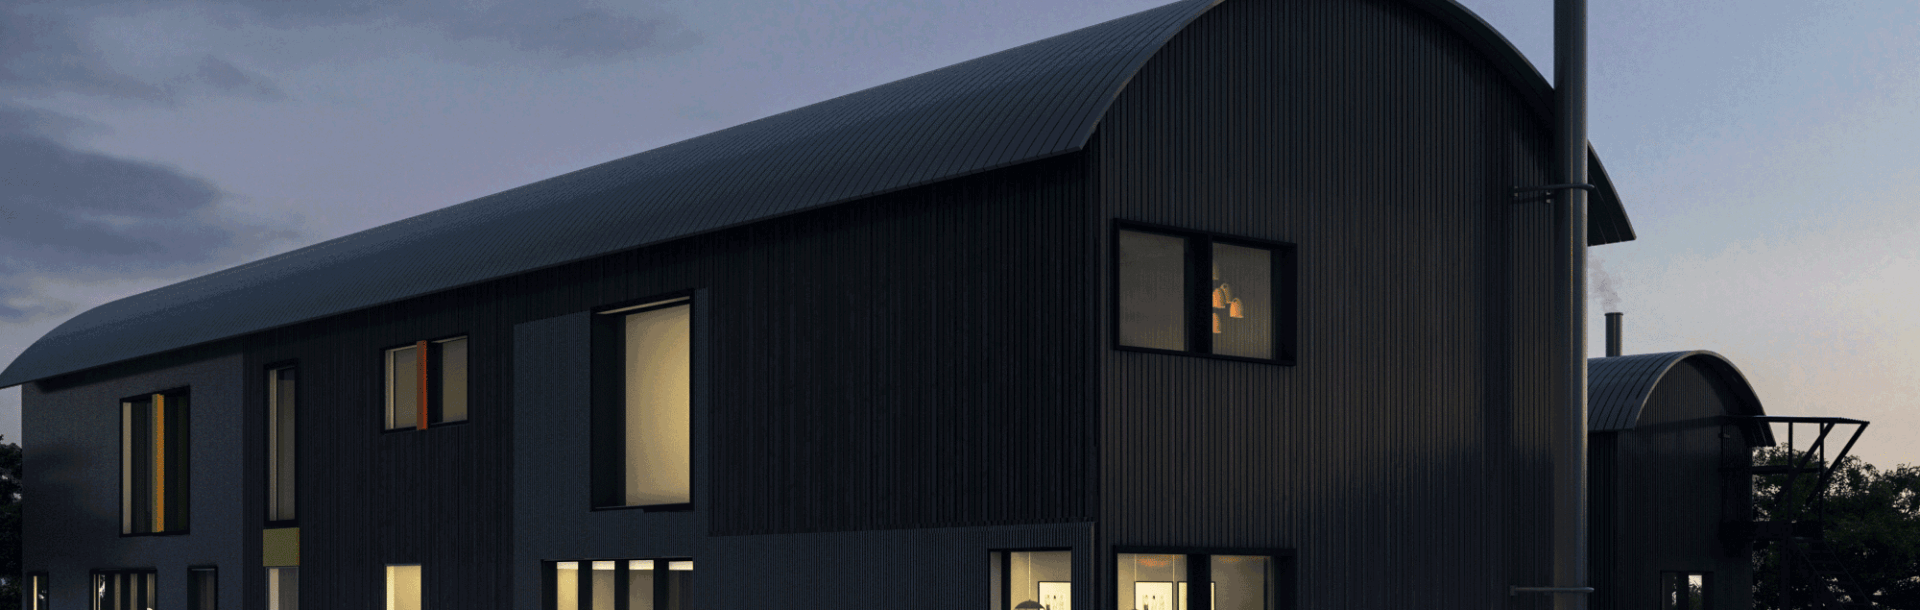 Dutch Barn conversion Herefordshire